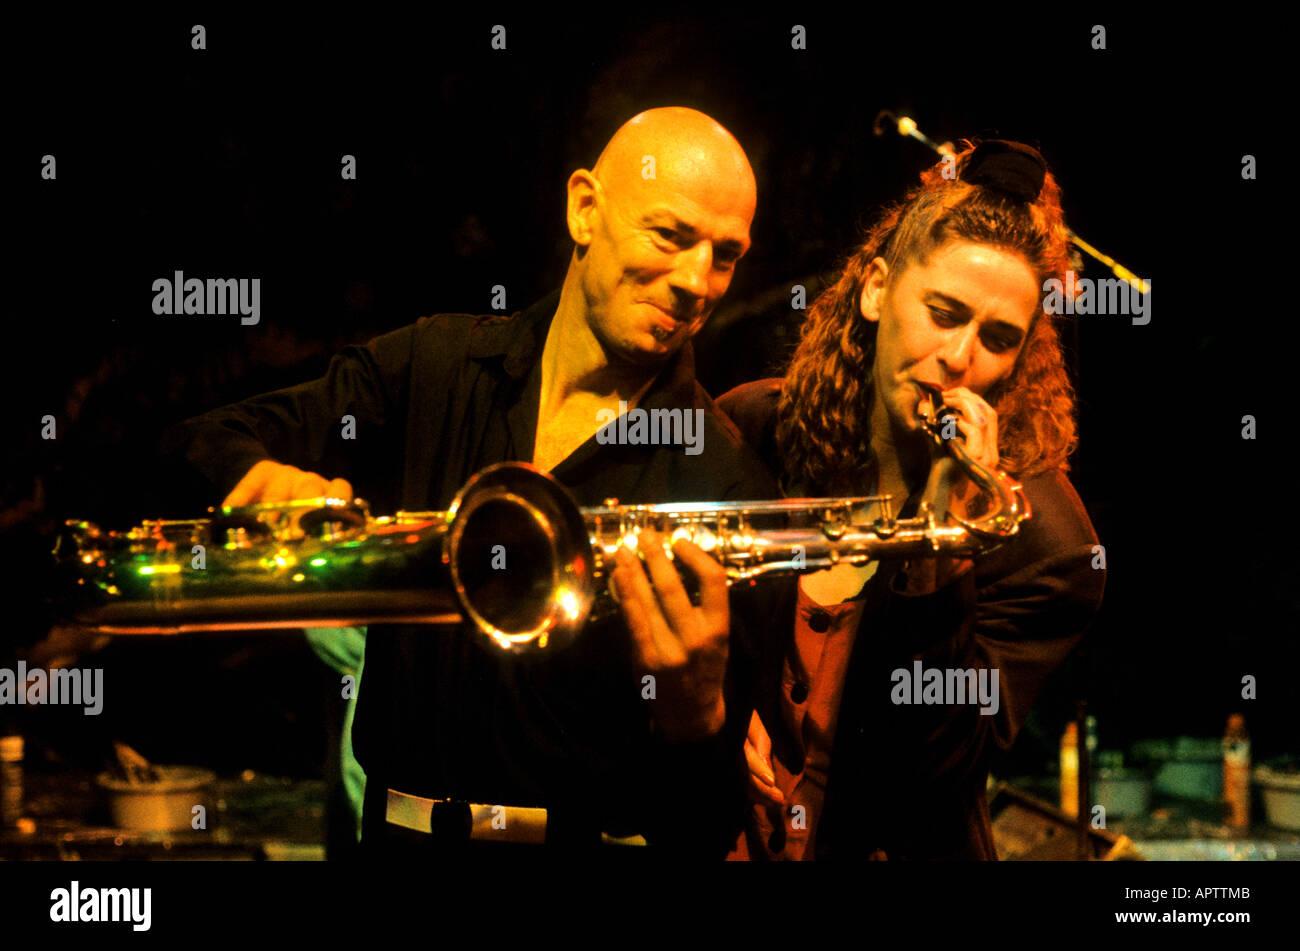 Amsterdam música Concierto de música Rock and Roll night live Foto de stock